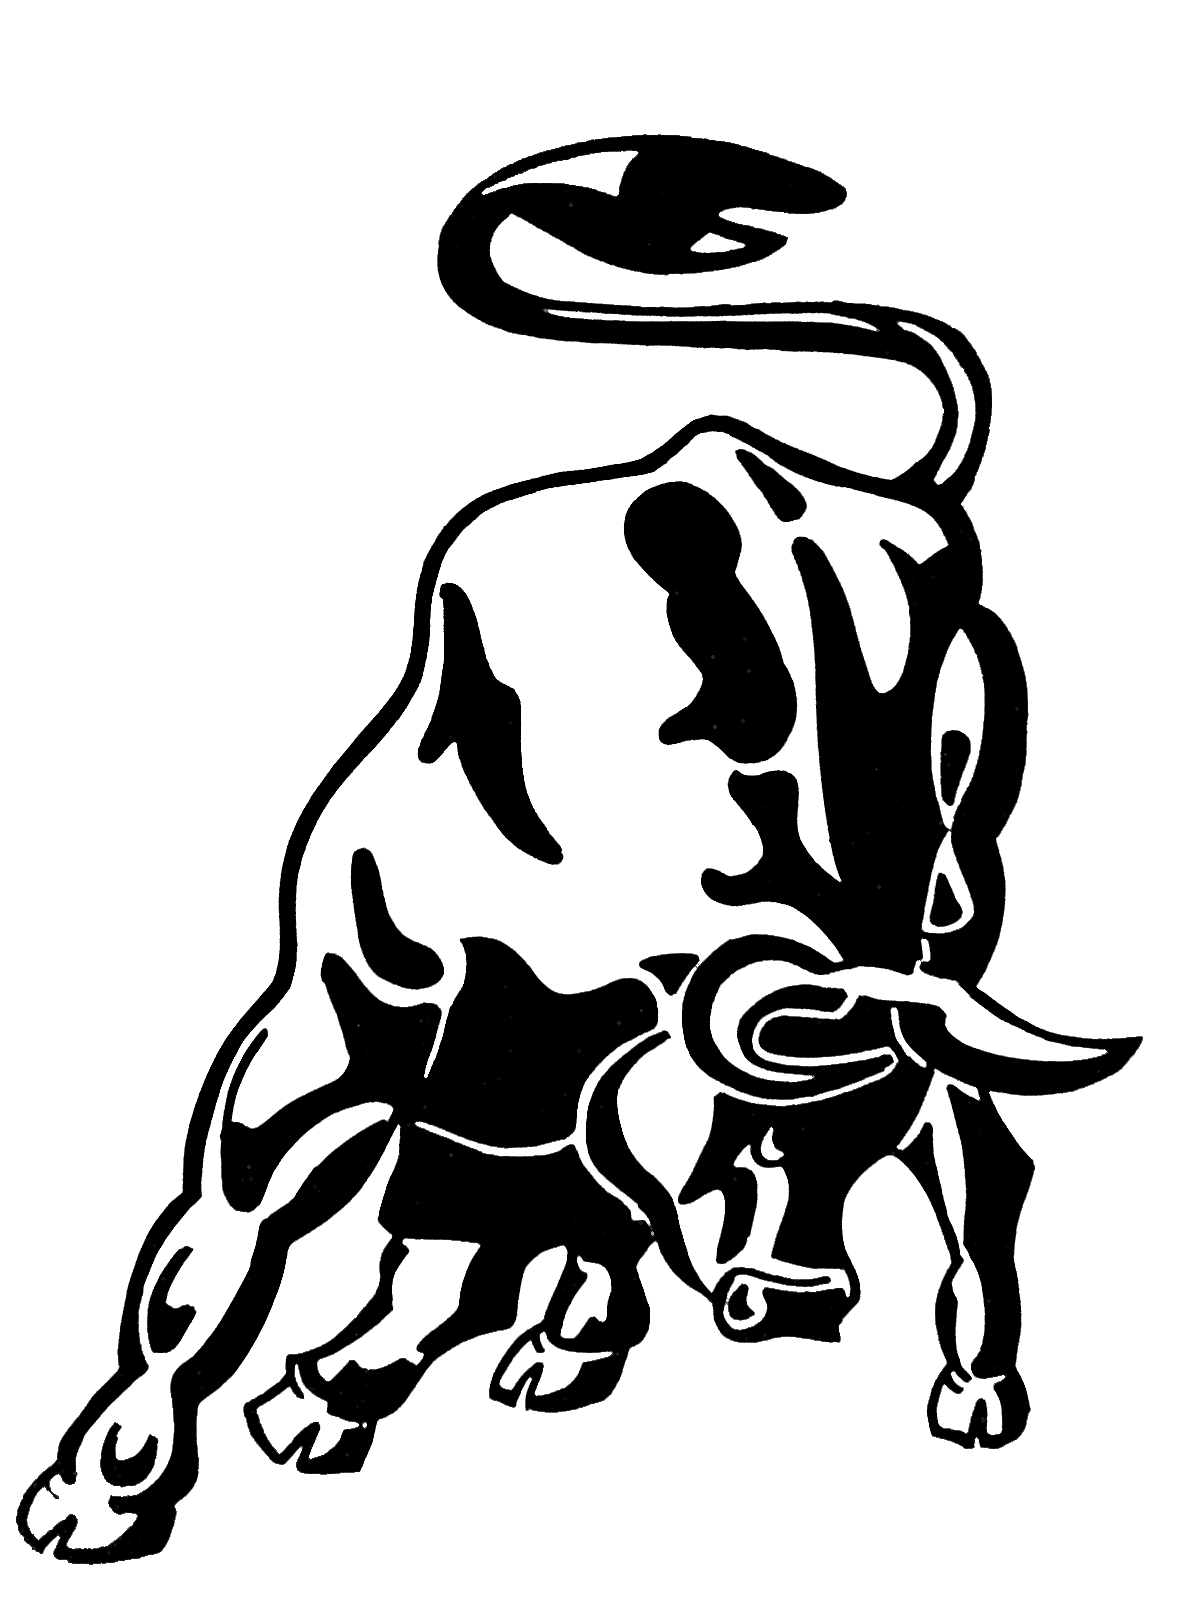 Car Logo Drawing At Getdrawings Free For Personal Use Car Logo